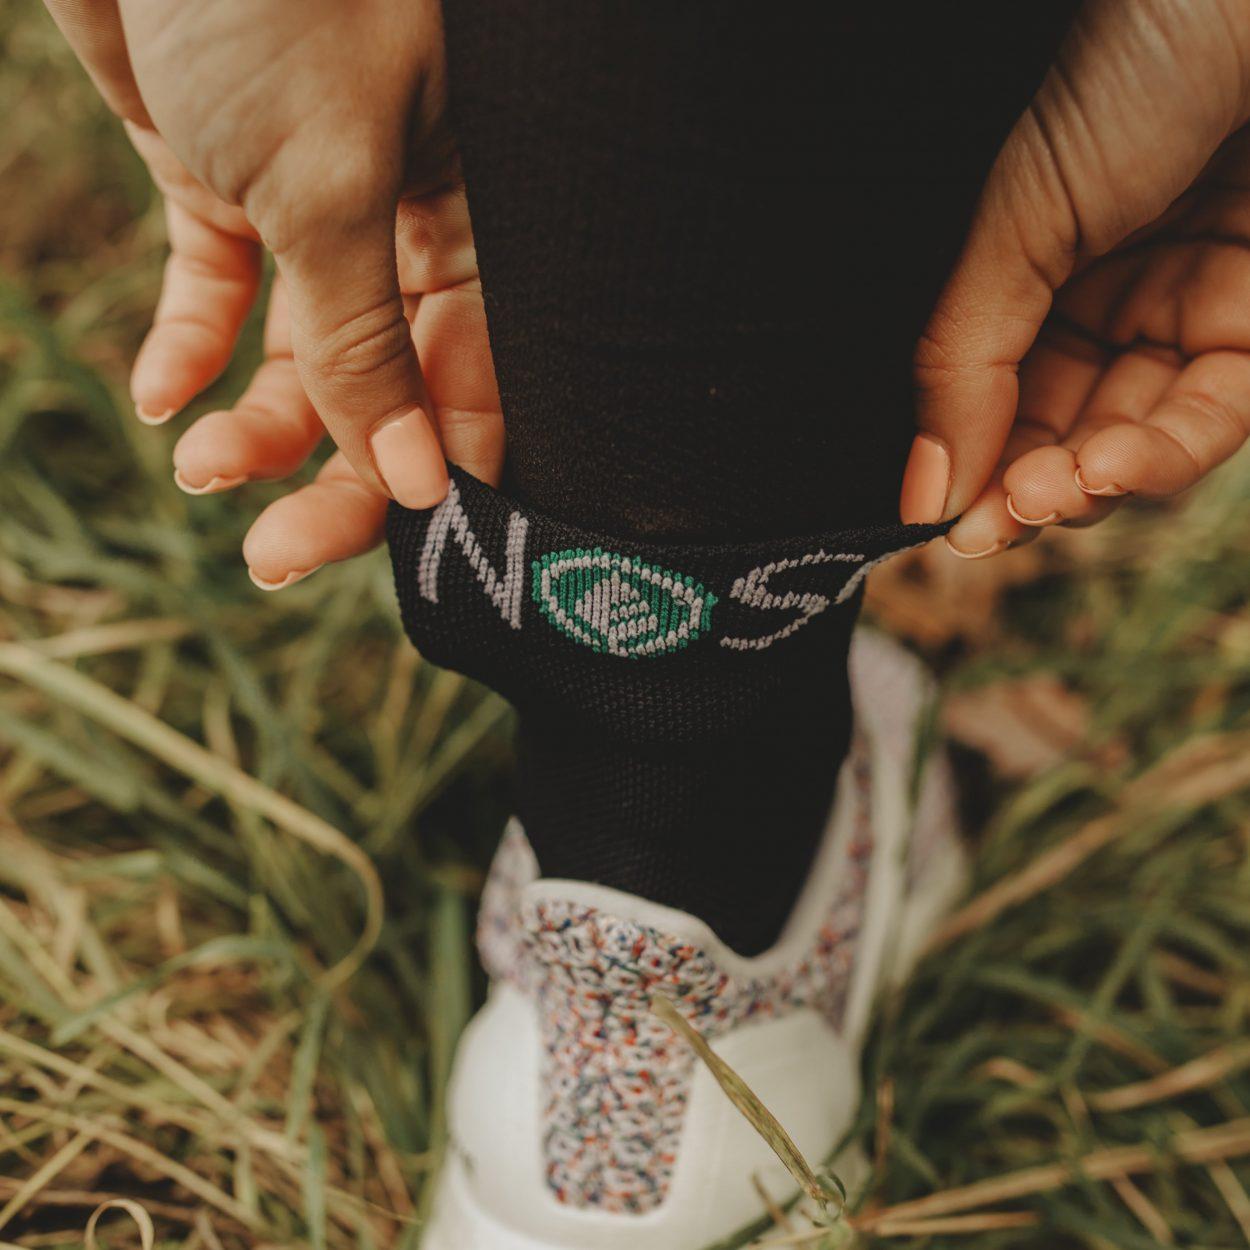 chaussette, sport, noir